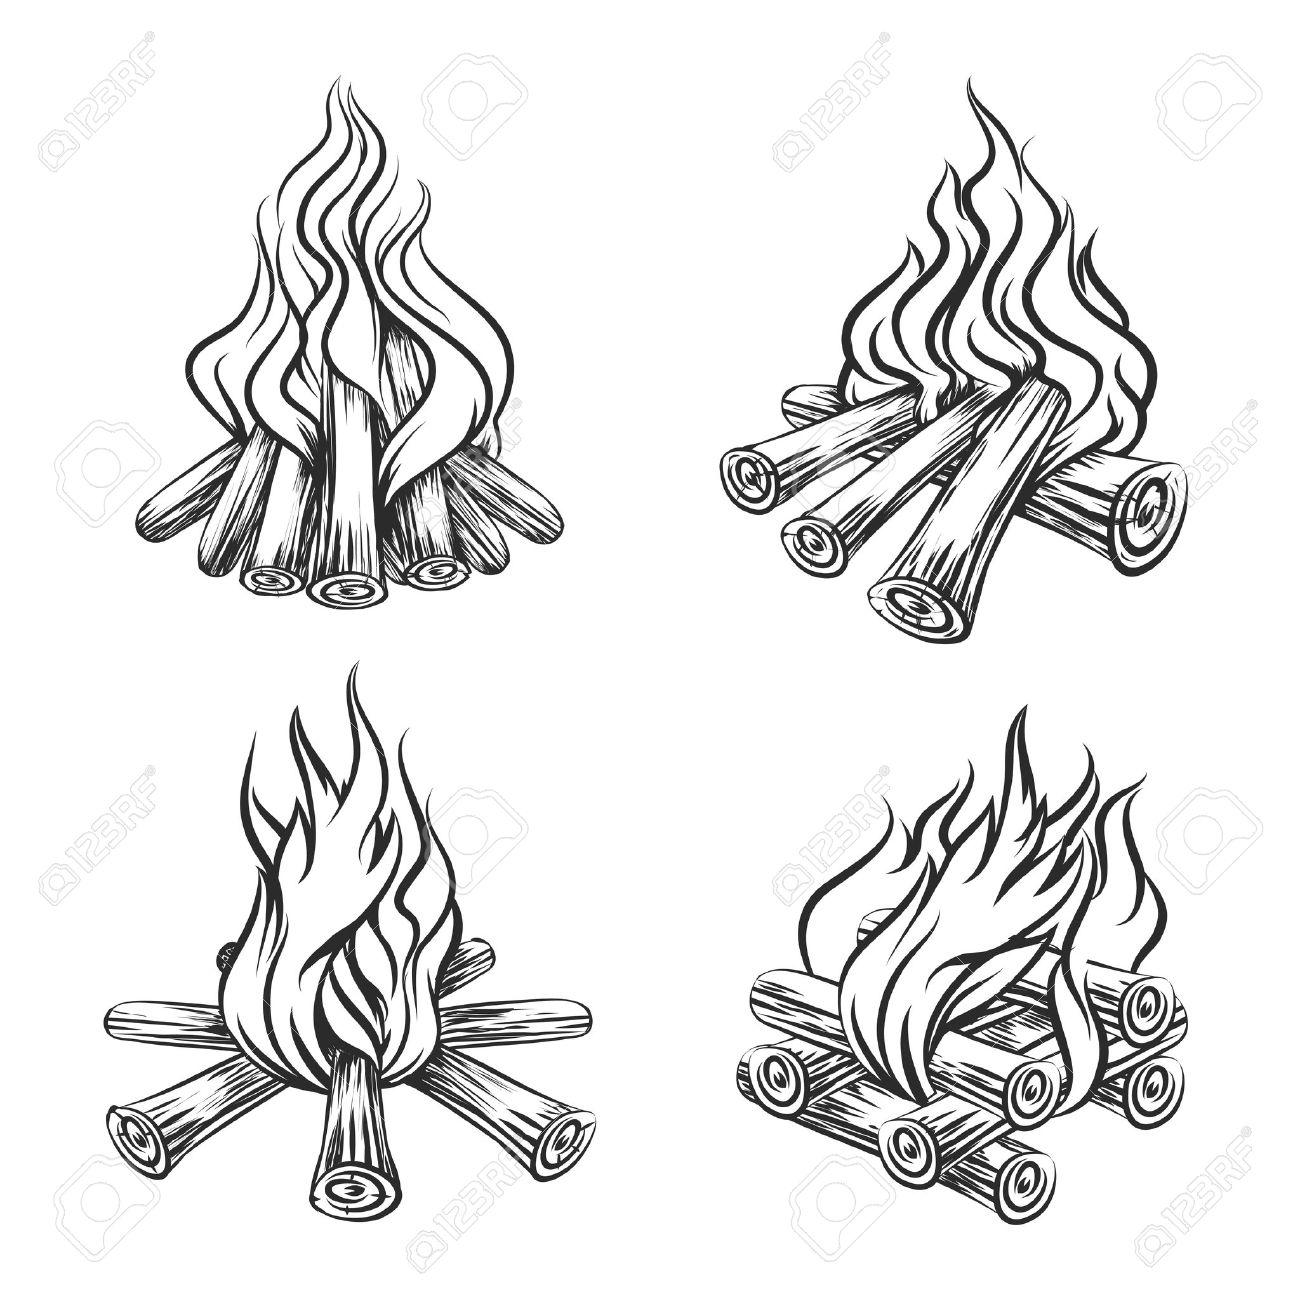 1300x1300 Hand Drawn Vector Bonfire Set. Flame And Burn, Firewood Energy